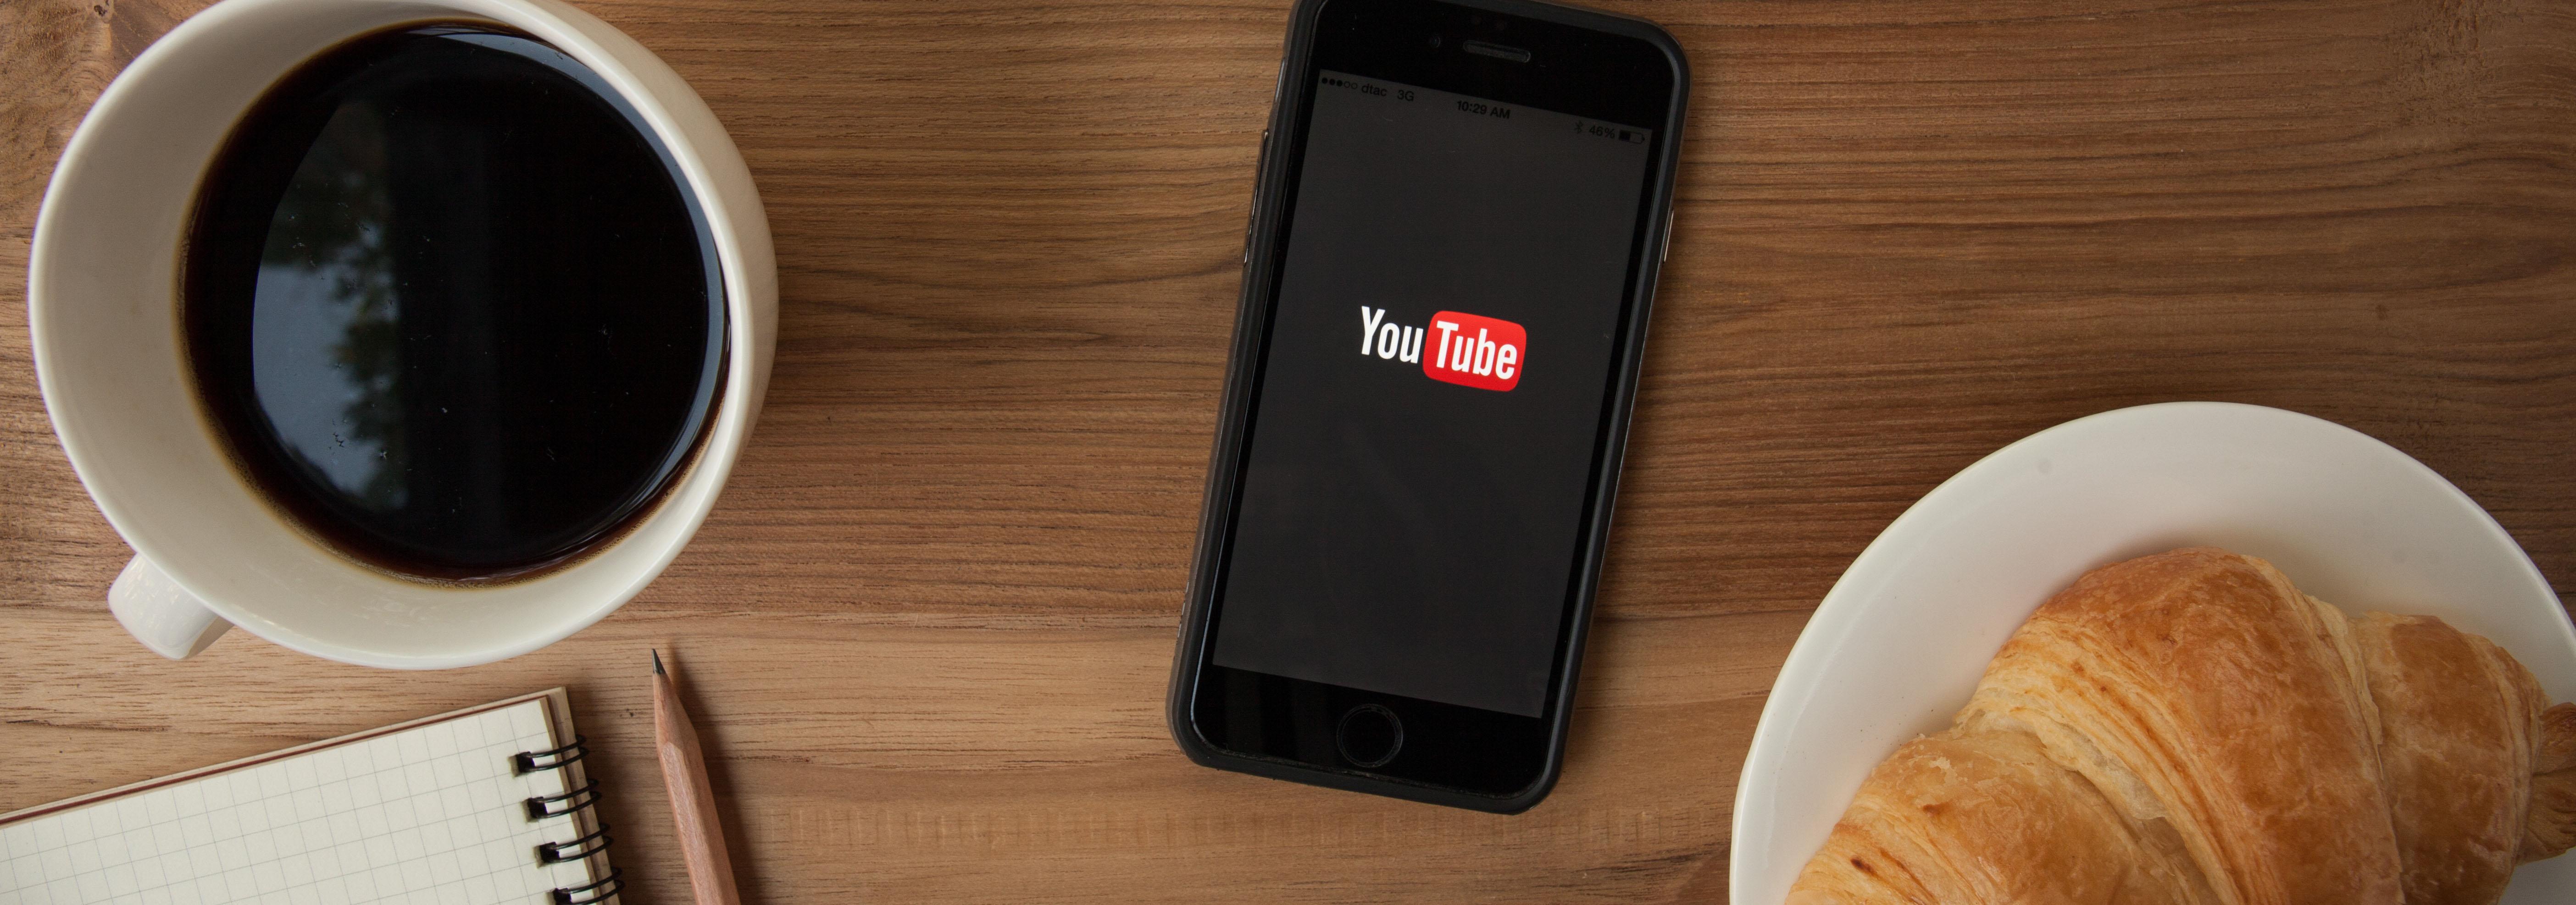 Starton_YouTube.jpg